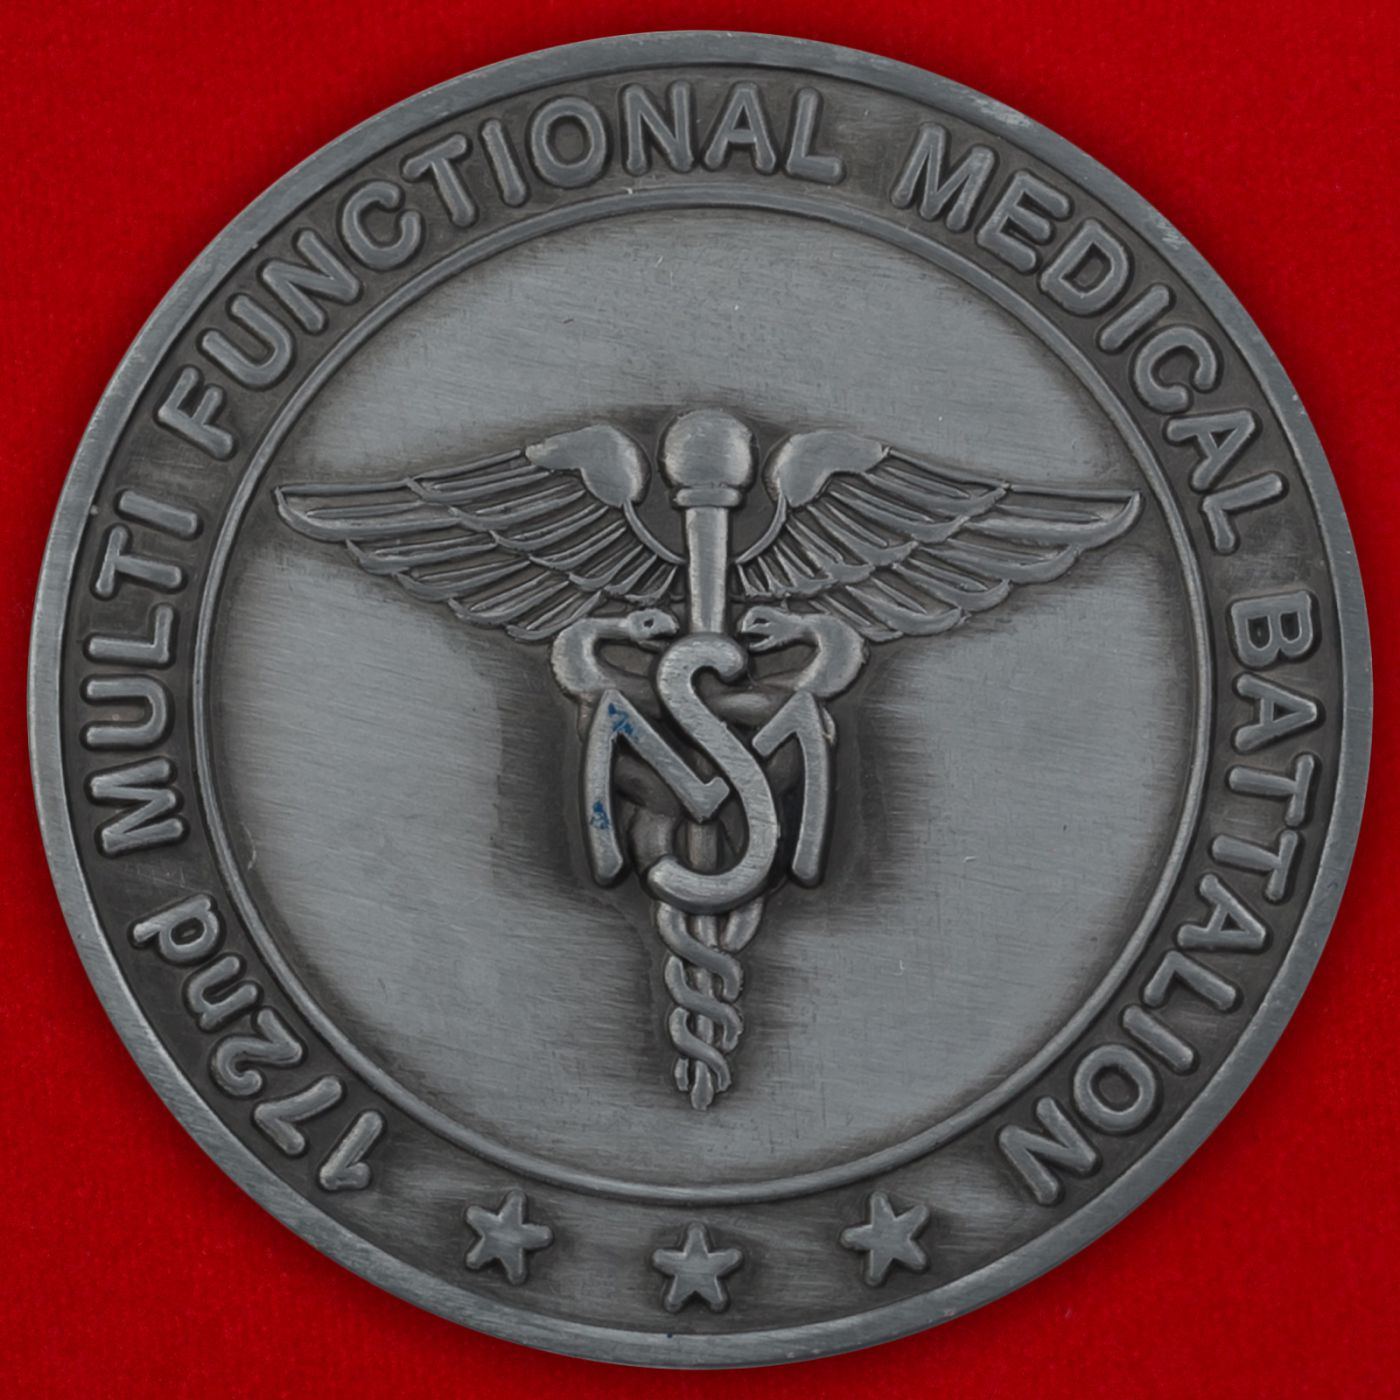 Челлендж коин 172-го Медицинского батальона